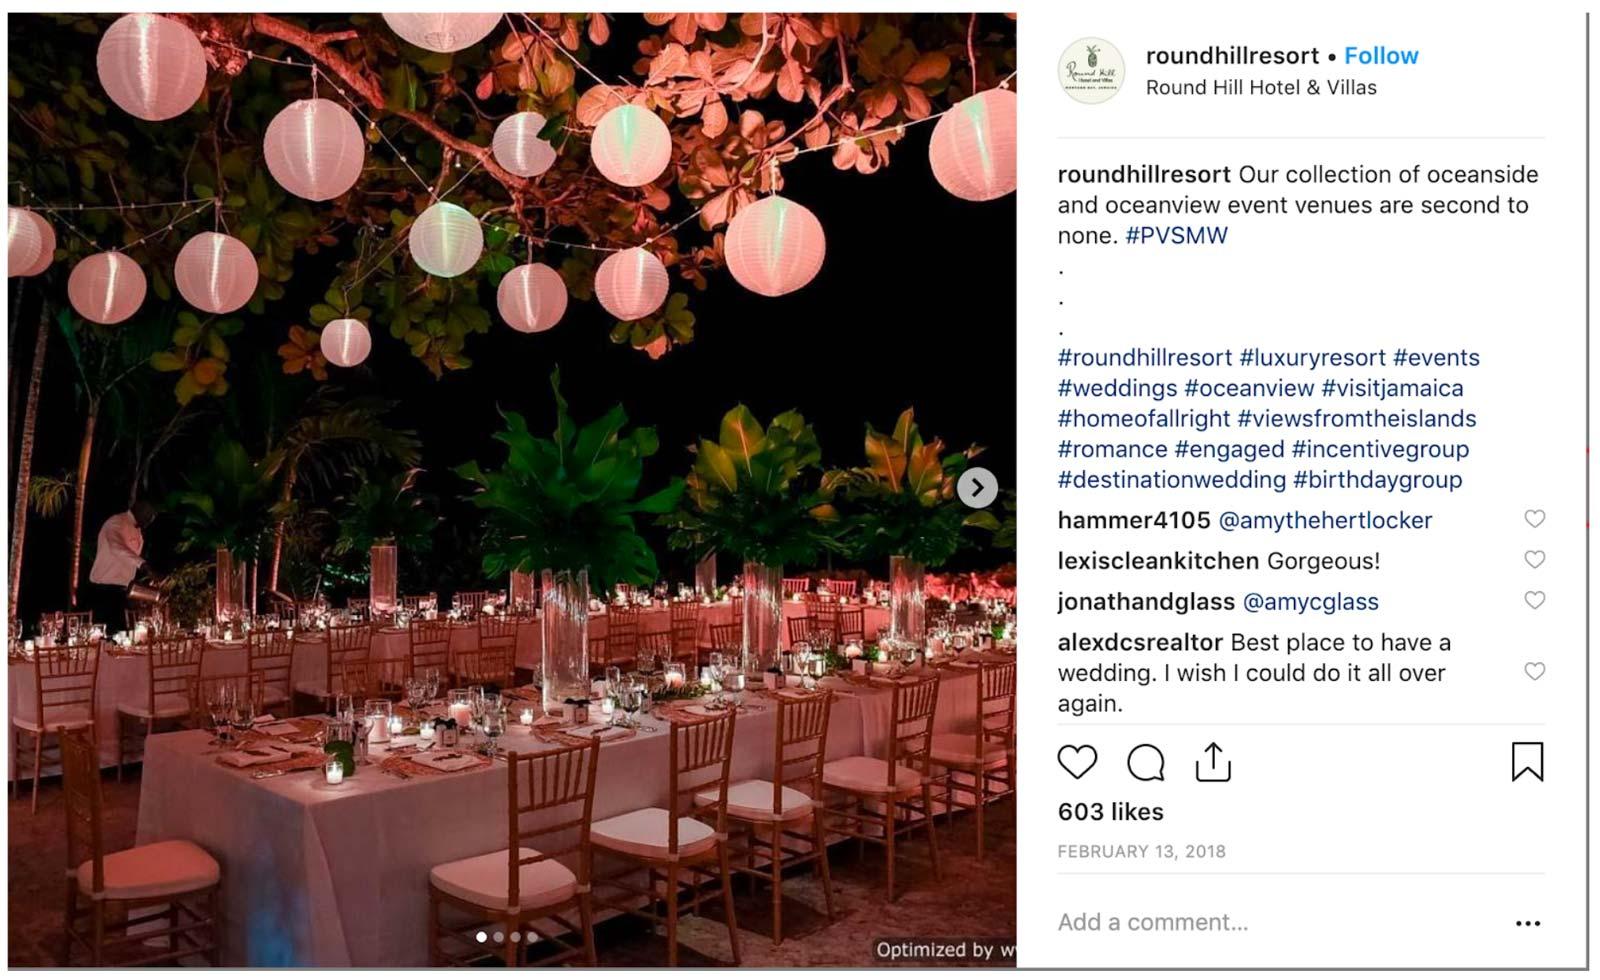 Round Hill Hotel, Prestigious Venues Social Media Week, 4